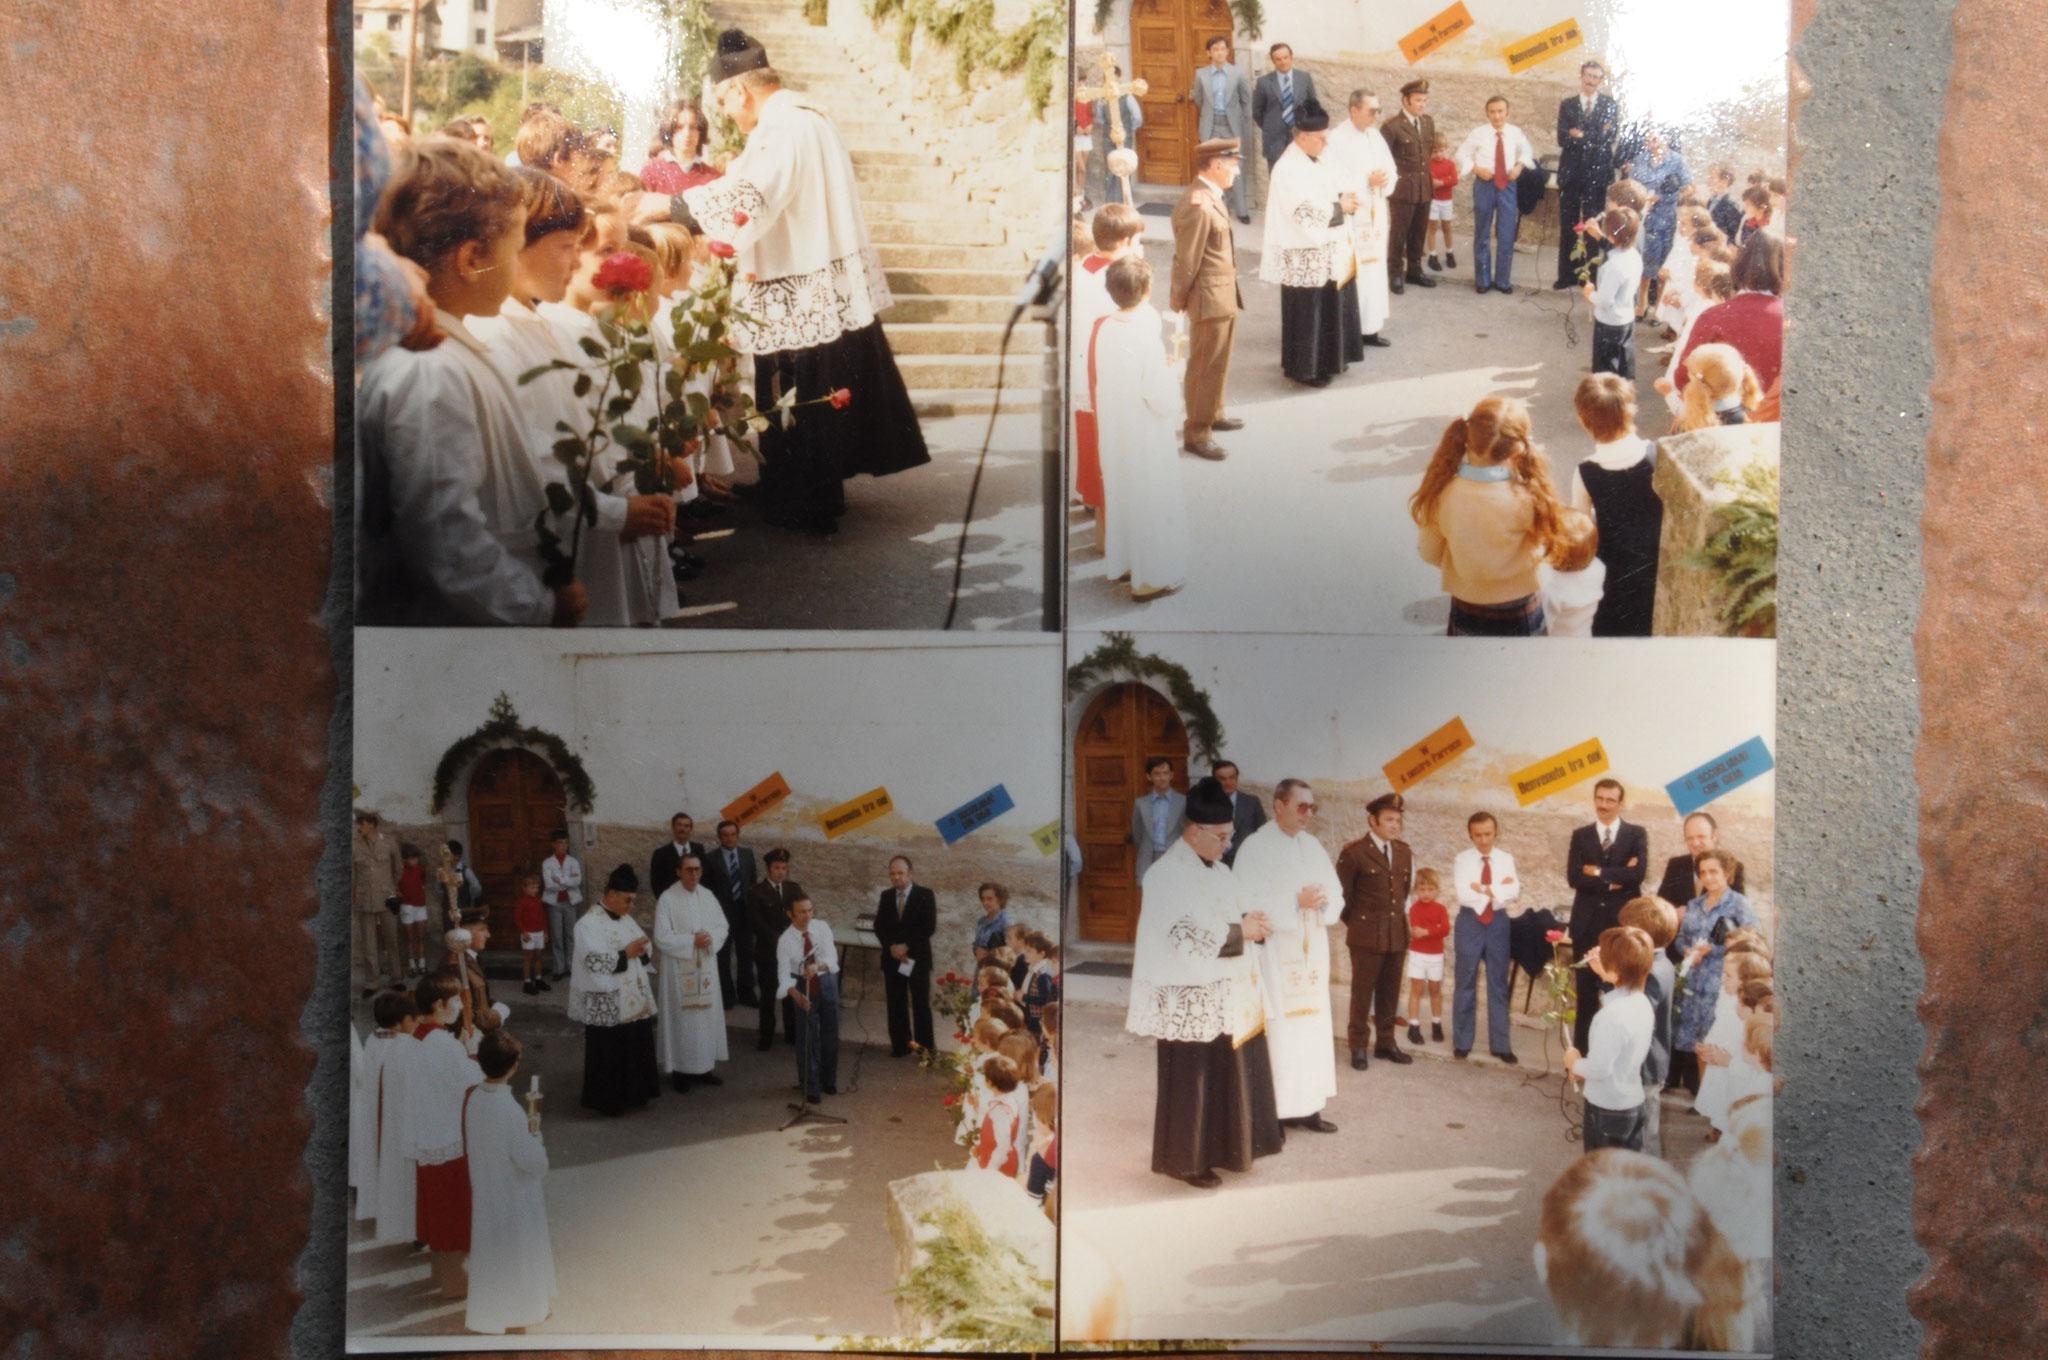 1980 Piazza Mes Castel Condino